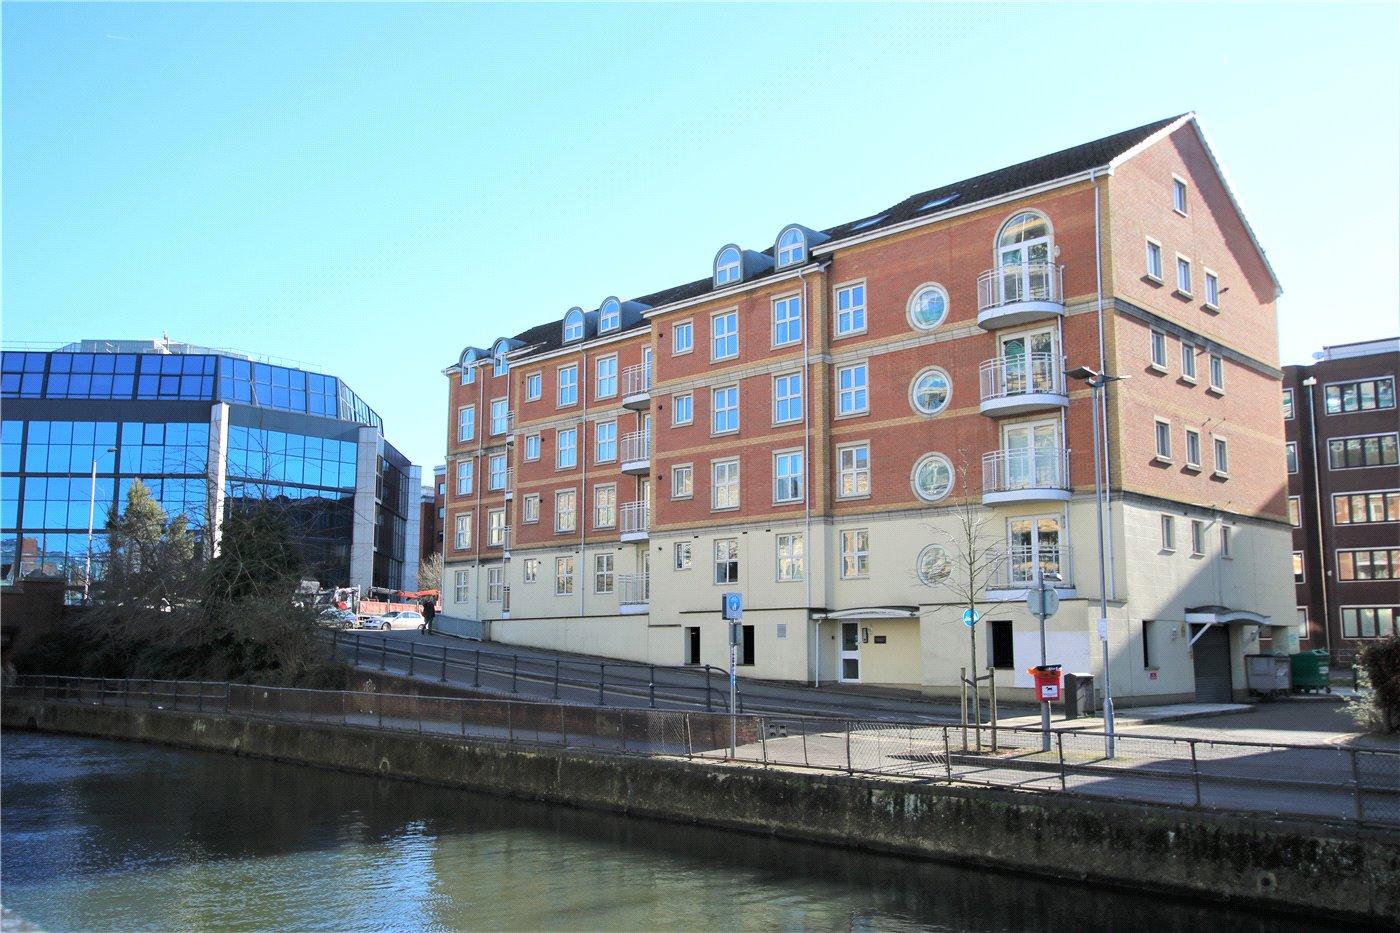 3 Bedrooms Flat for sale in Grantley Heights, Kennet Side, Reading, Berkshire, RG1